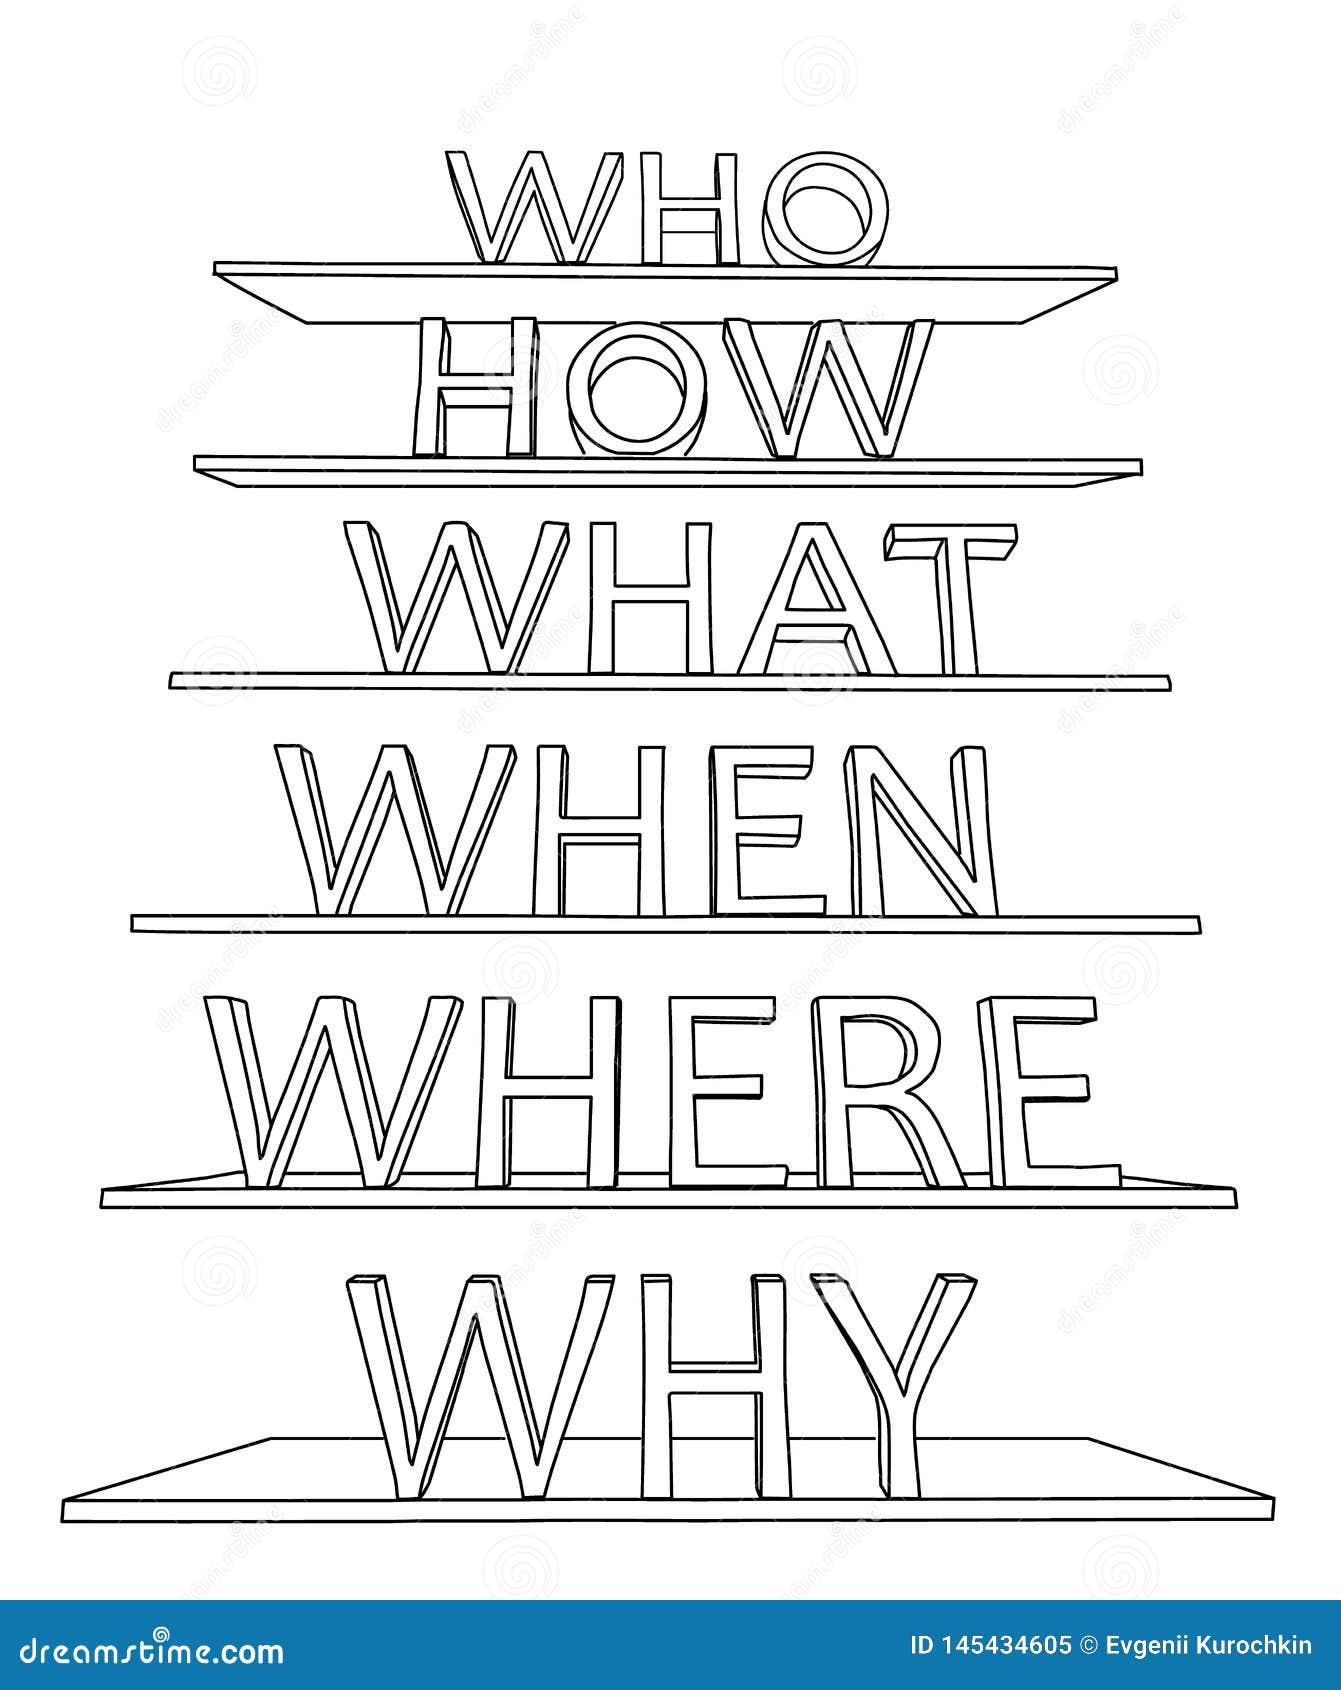 Pytania Kipling 5W1H